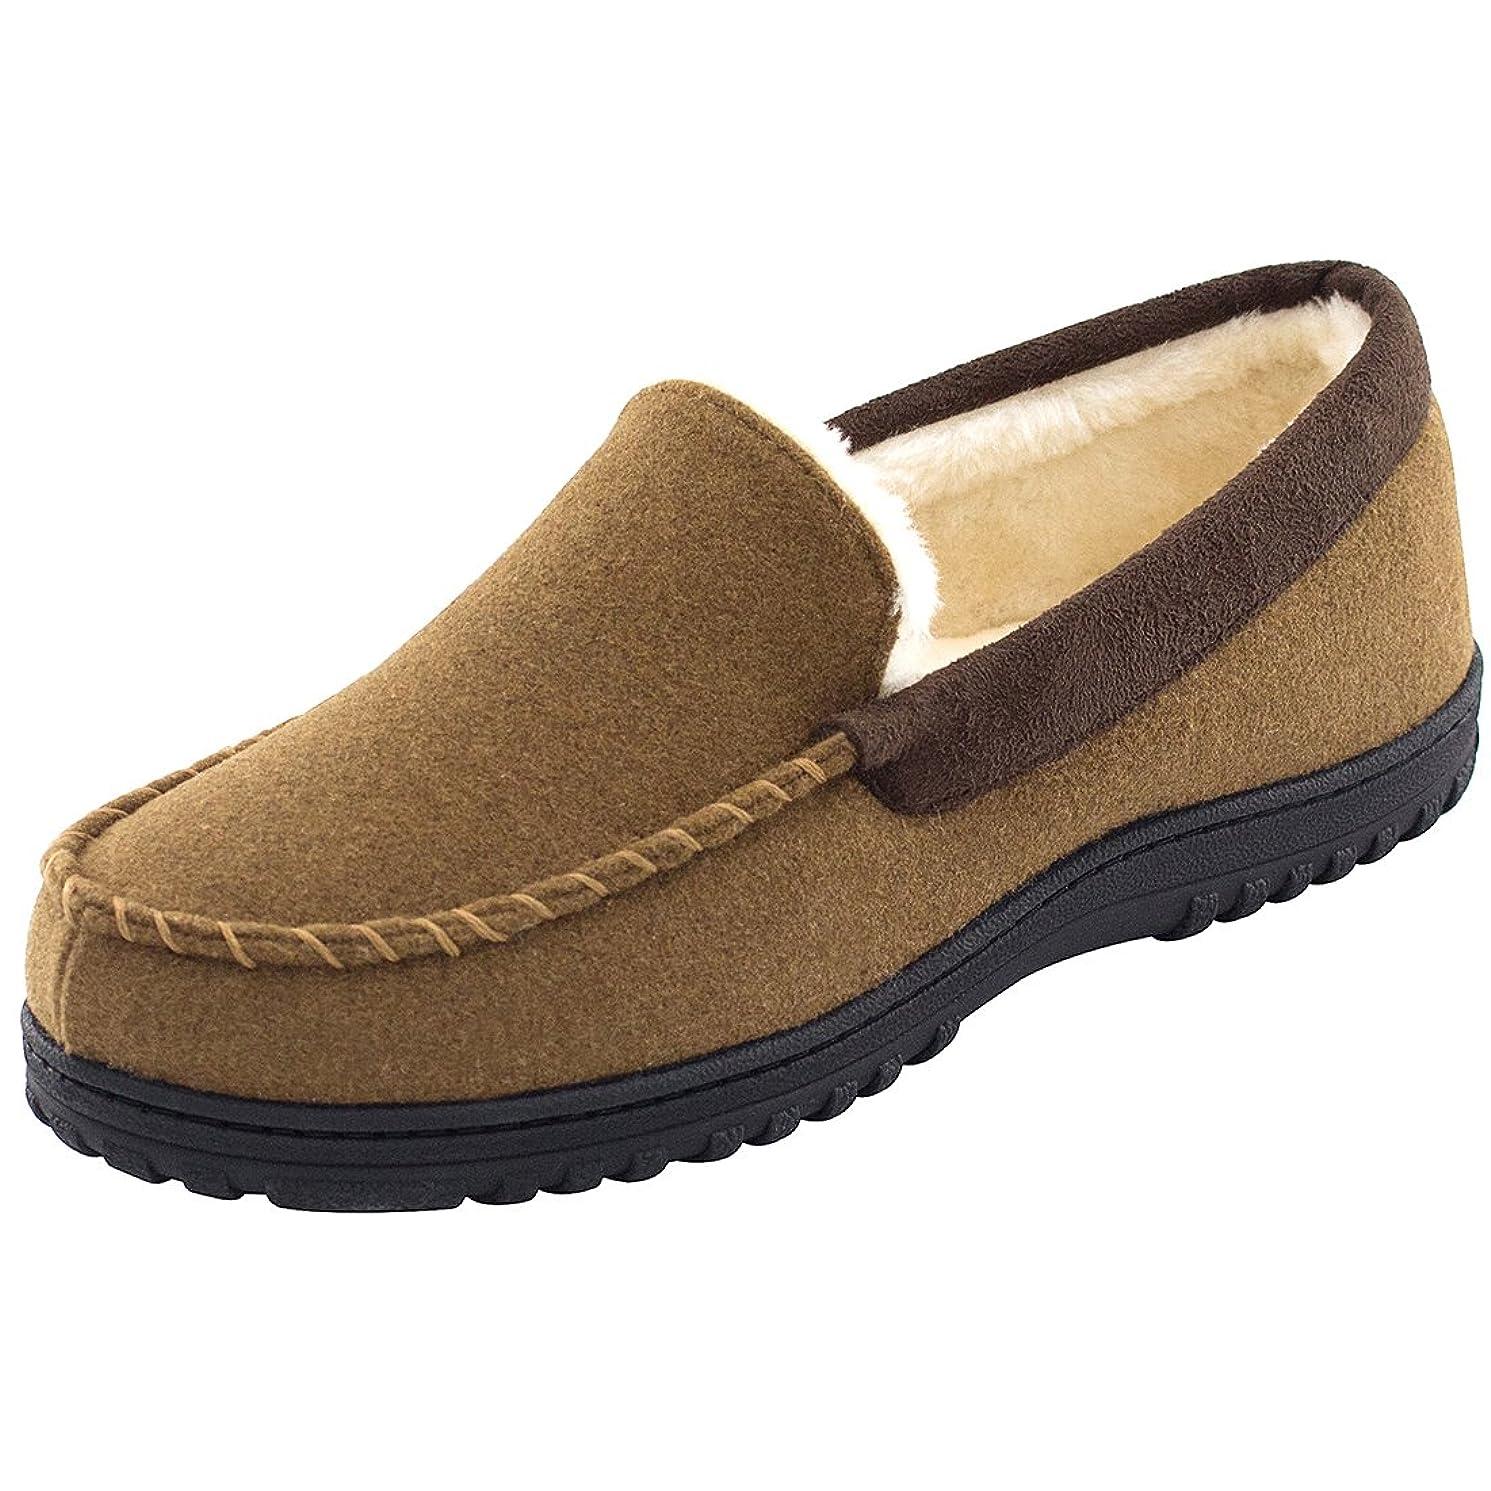 Men's Wool Micro Suede Moccasin Slippers House Shoes Indoor/Outdoor